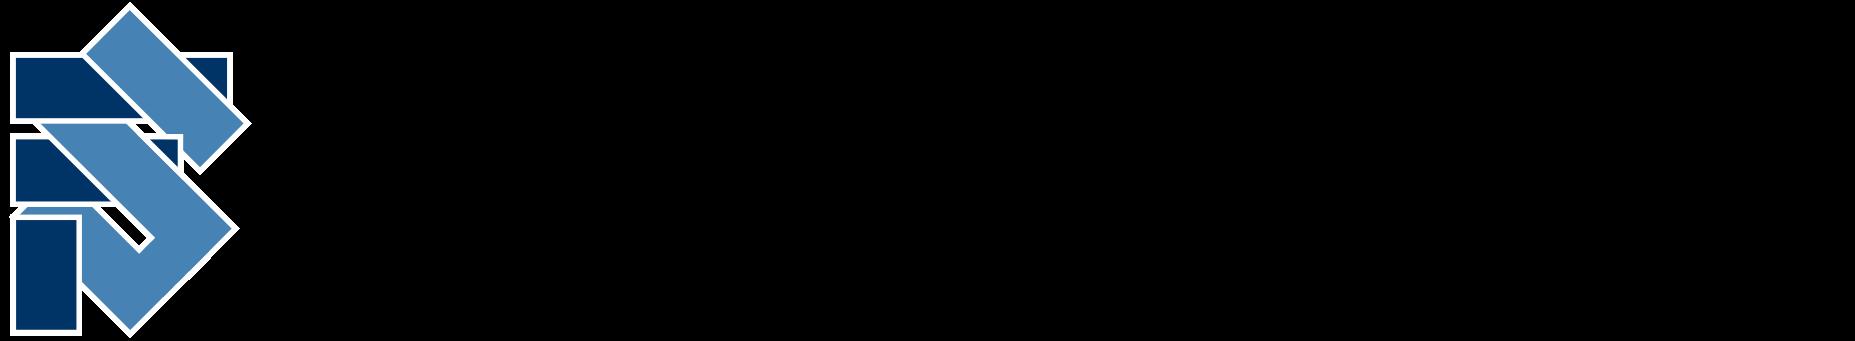 Intestazione SFS Baskerville MAIUSC Blu Acciaio